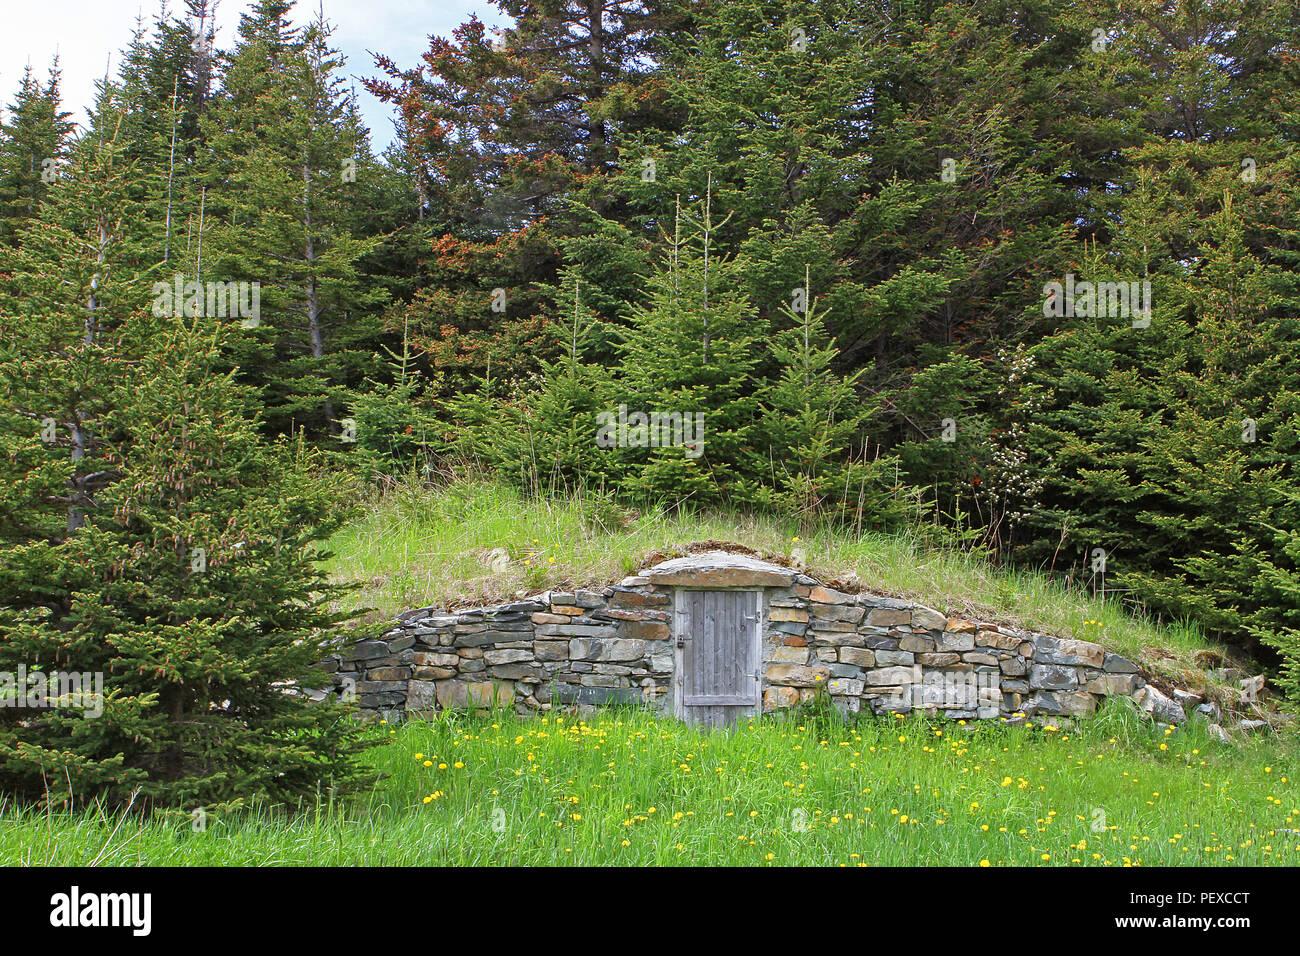 Elliston, Neufundland, Kanada. Die Wurzel Keller Hauptstadt der Welt. Stockbild